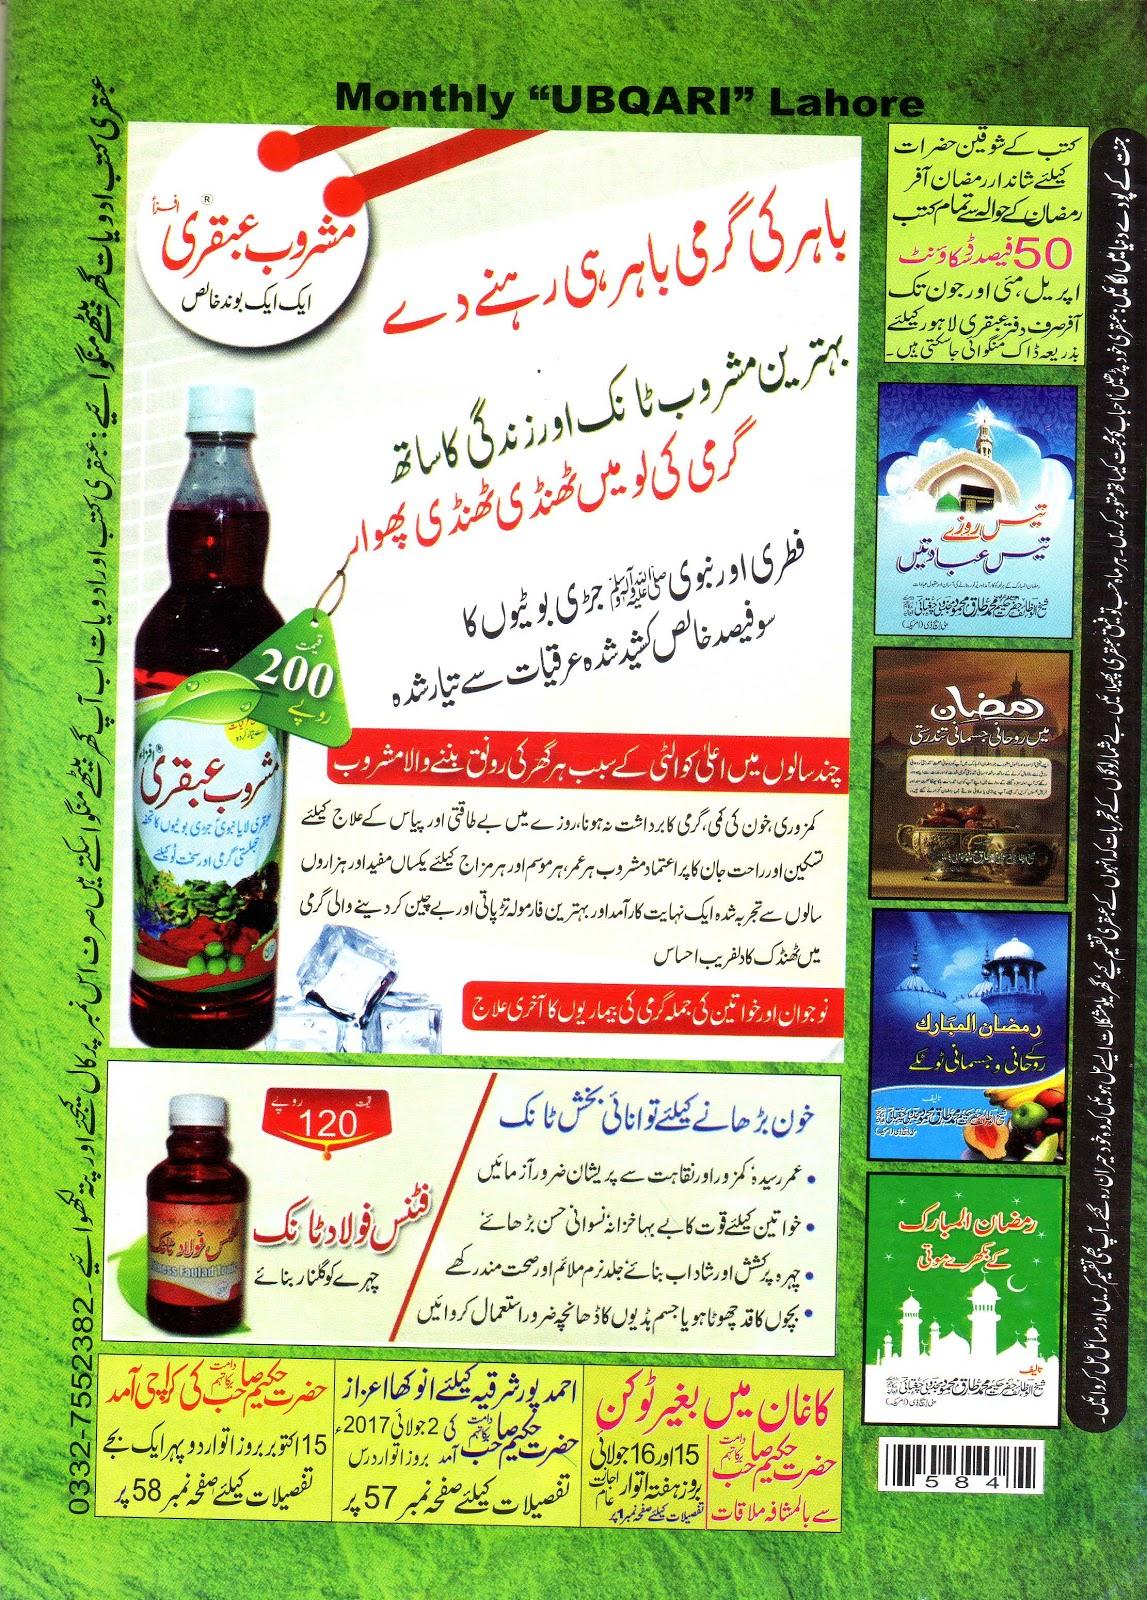 Back Page Ubqari Magazine June 2017